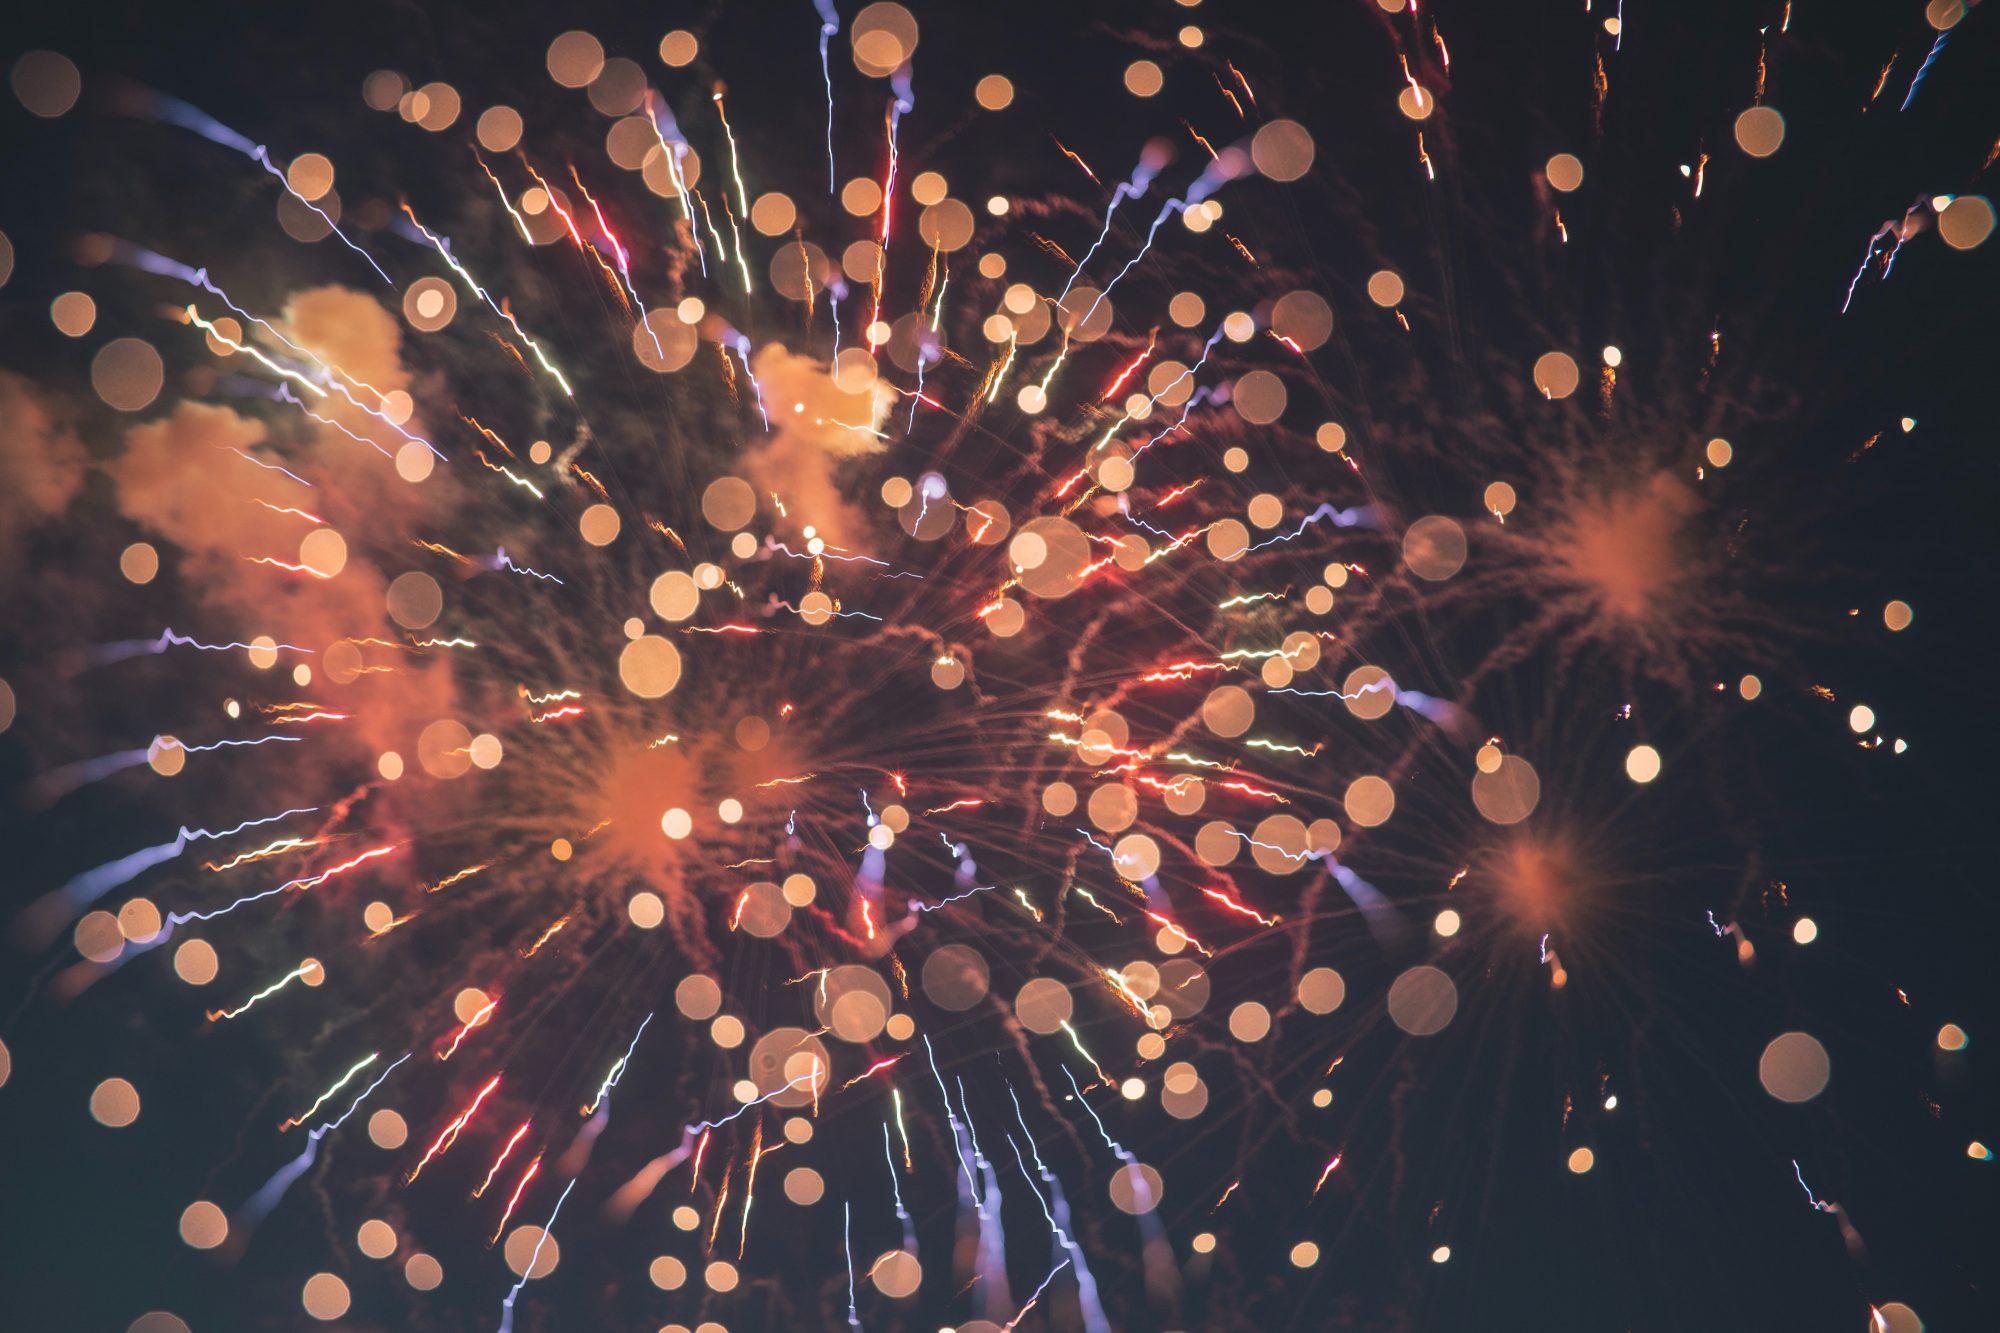 Fireworks by Erwan Hesry